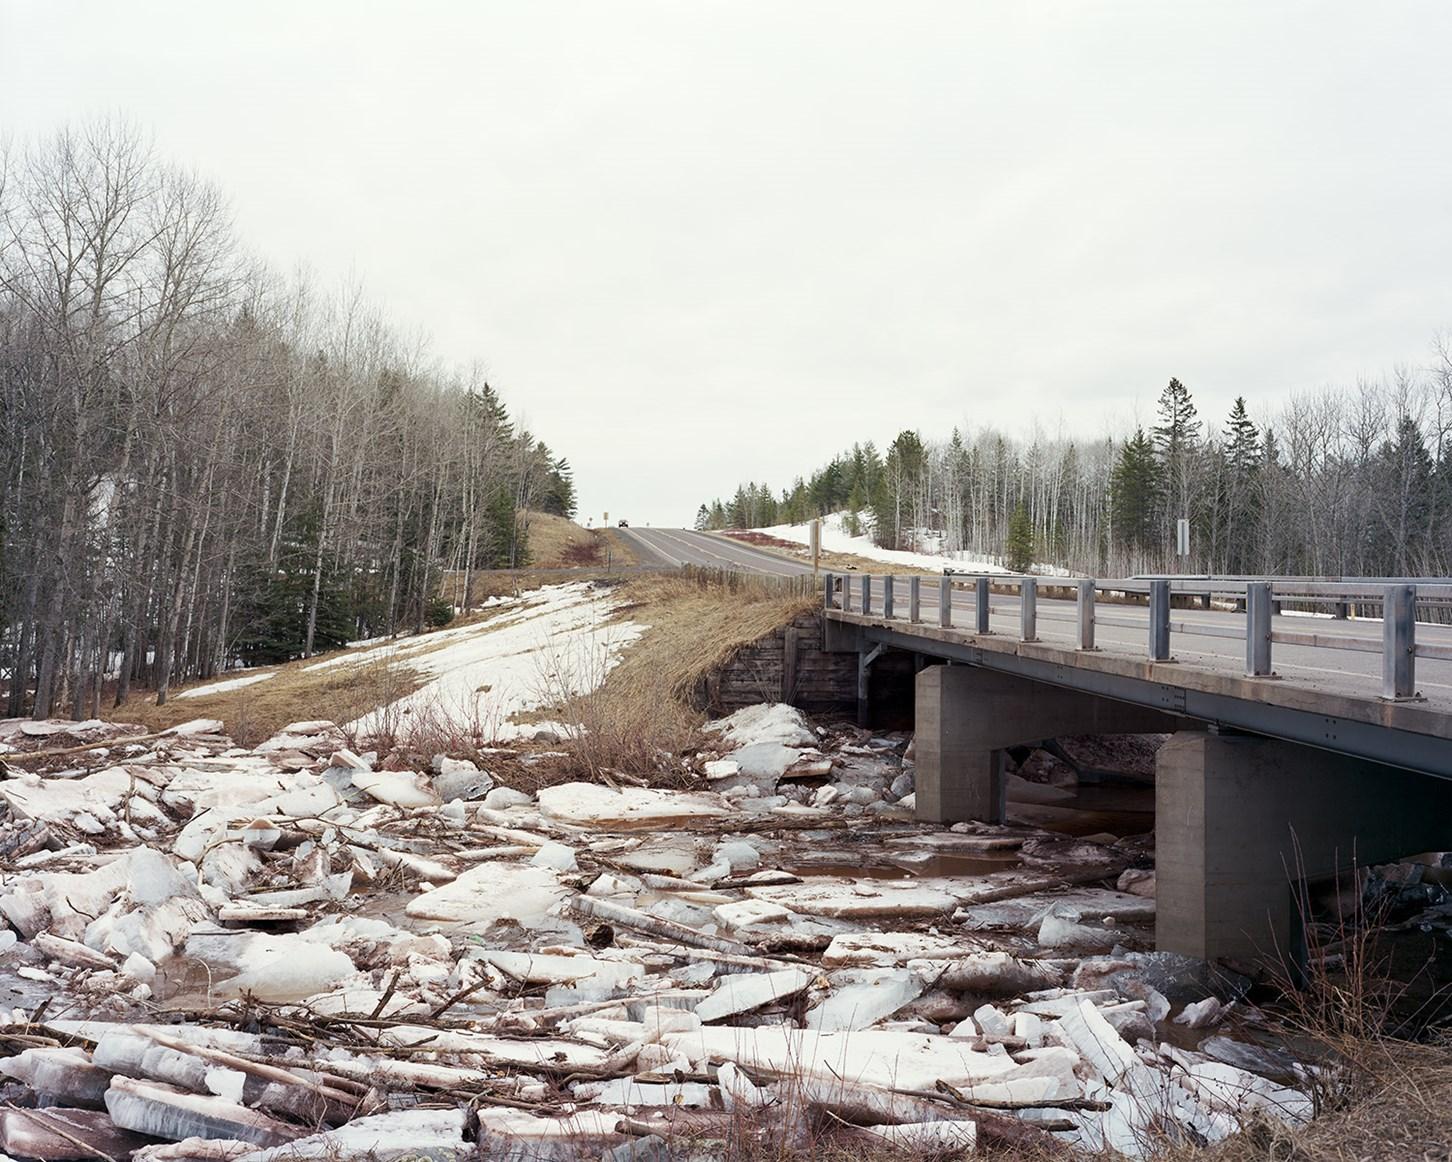 Ice Jam, Superior, Wisconsin, April 2014